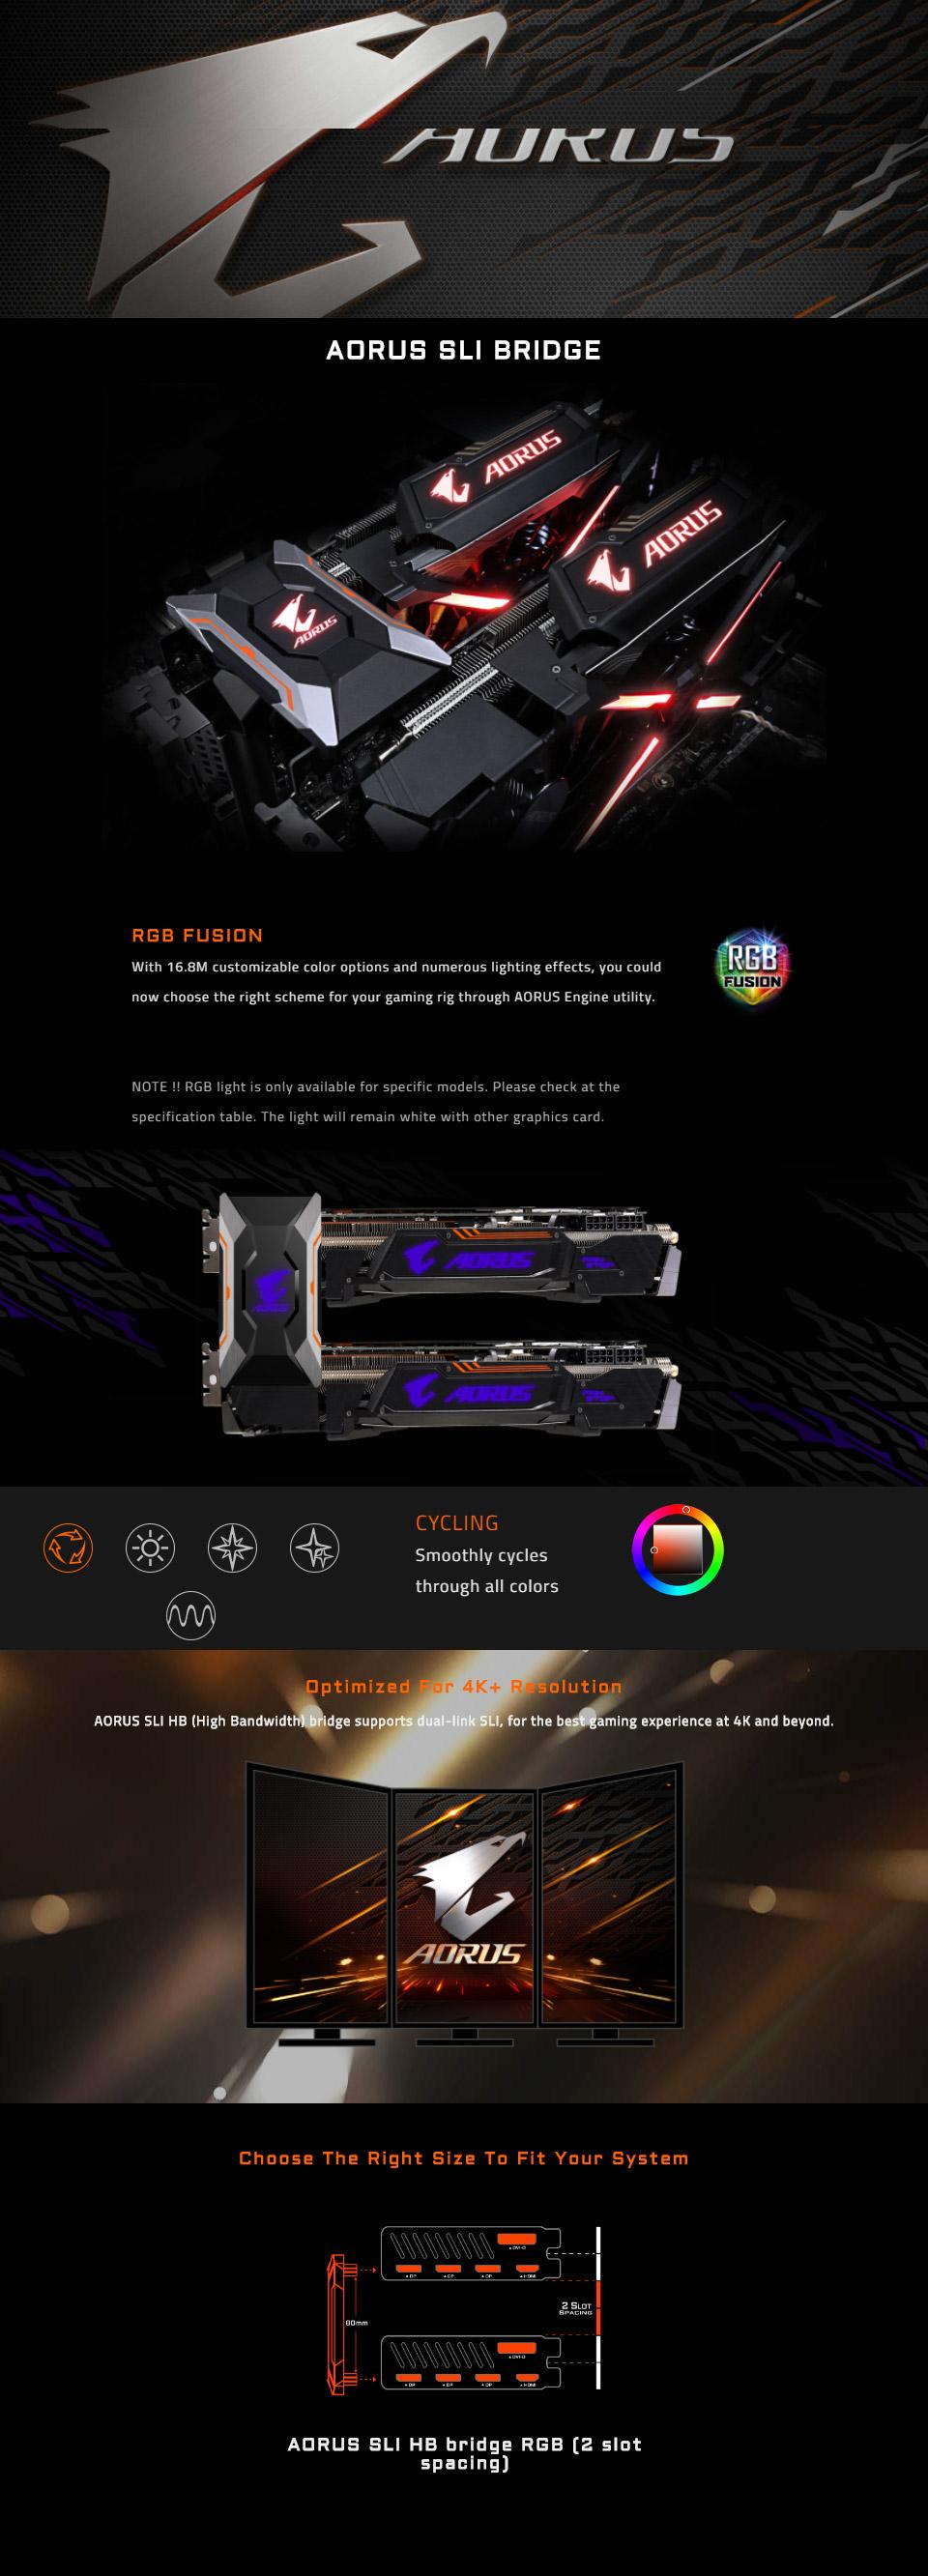 Gigabyte Aorus RGB SLI HB bridge (2 Slot Spacing)